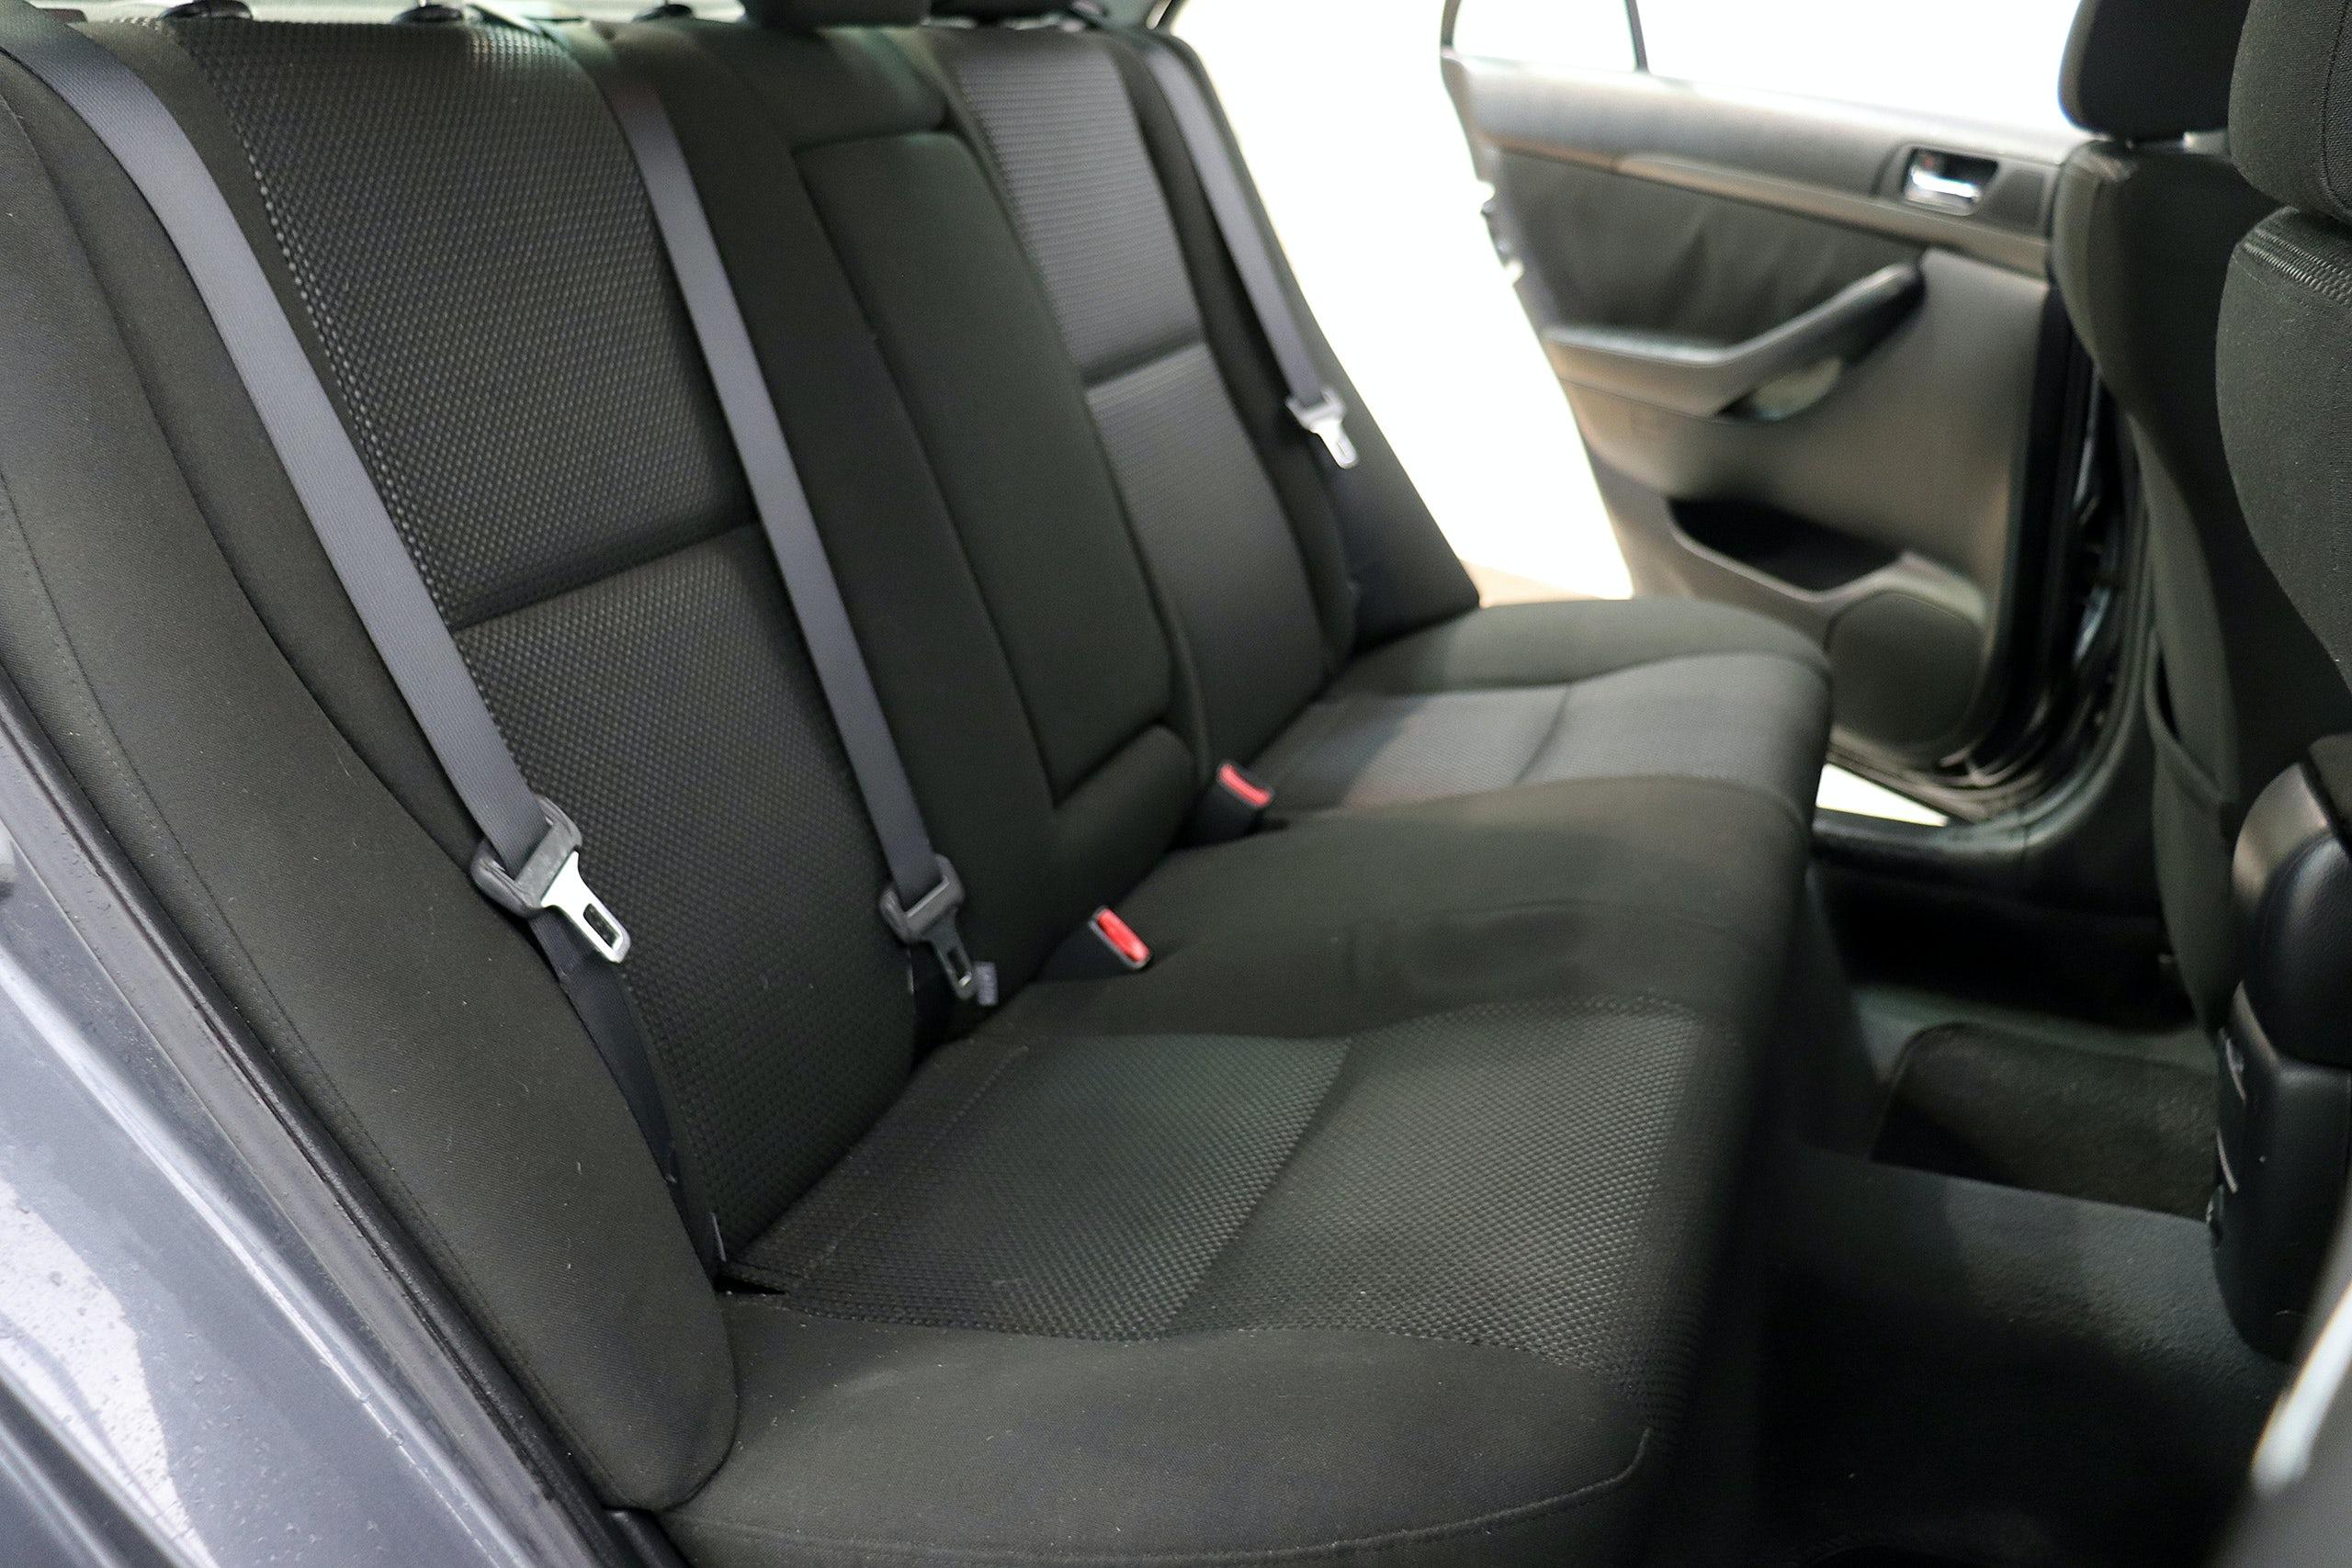 Toyota Avensis 2.2 D-4D 150cv Sol 4p